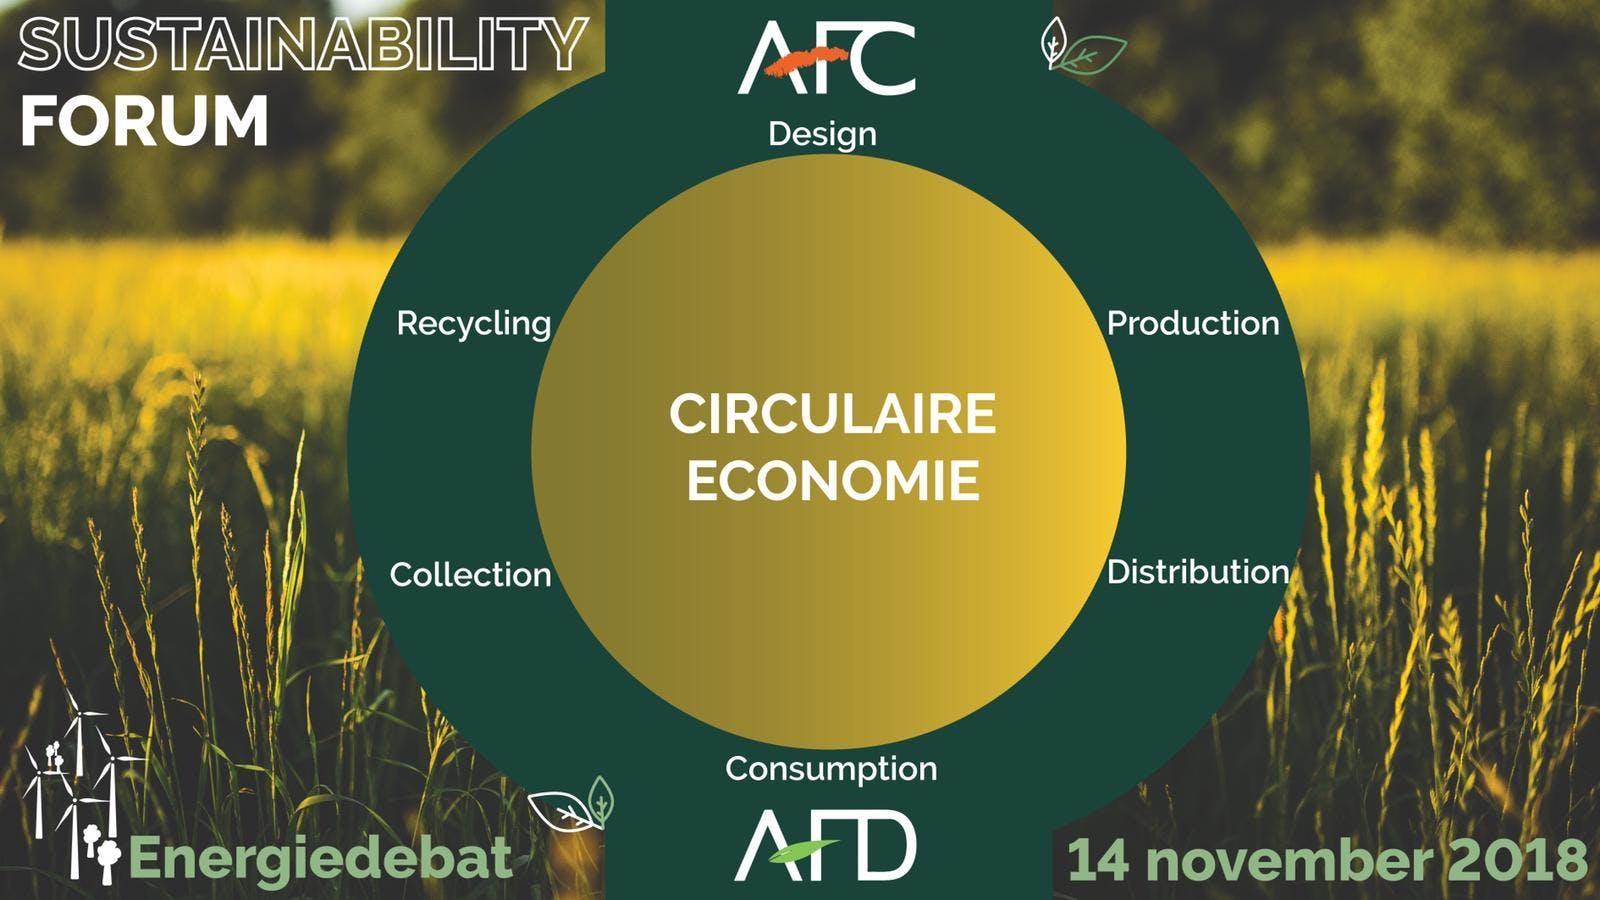 Sustainability Forum